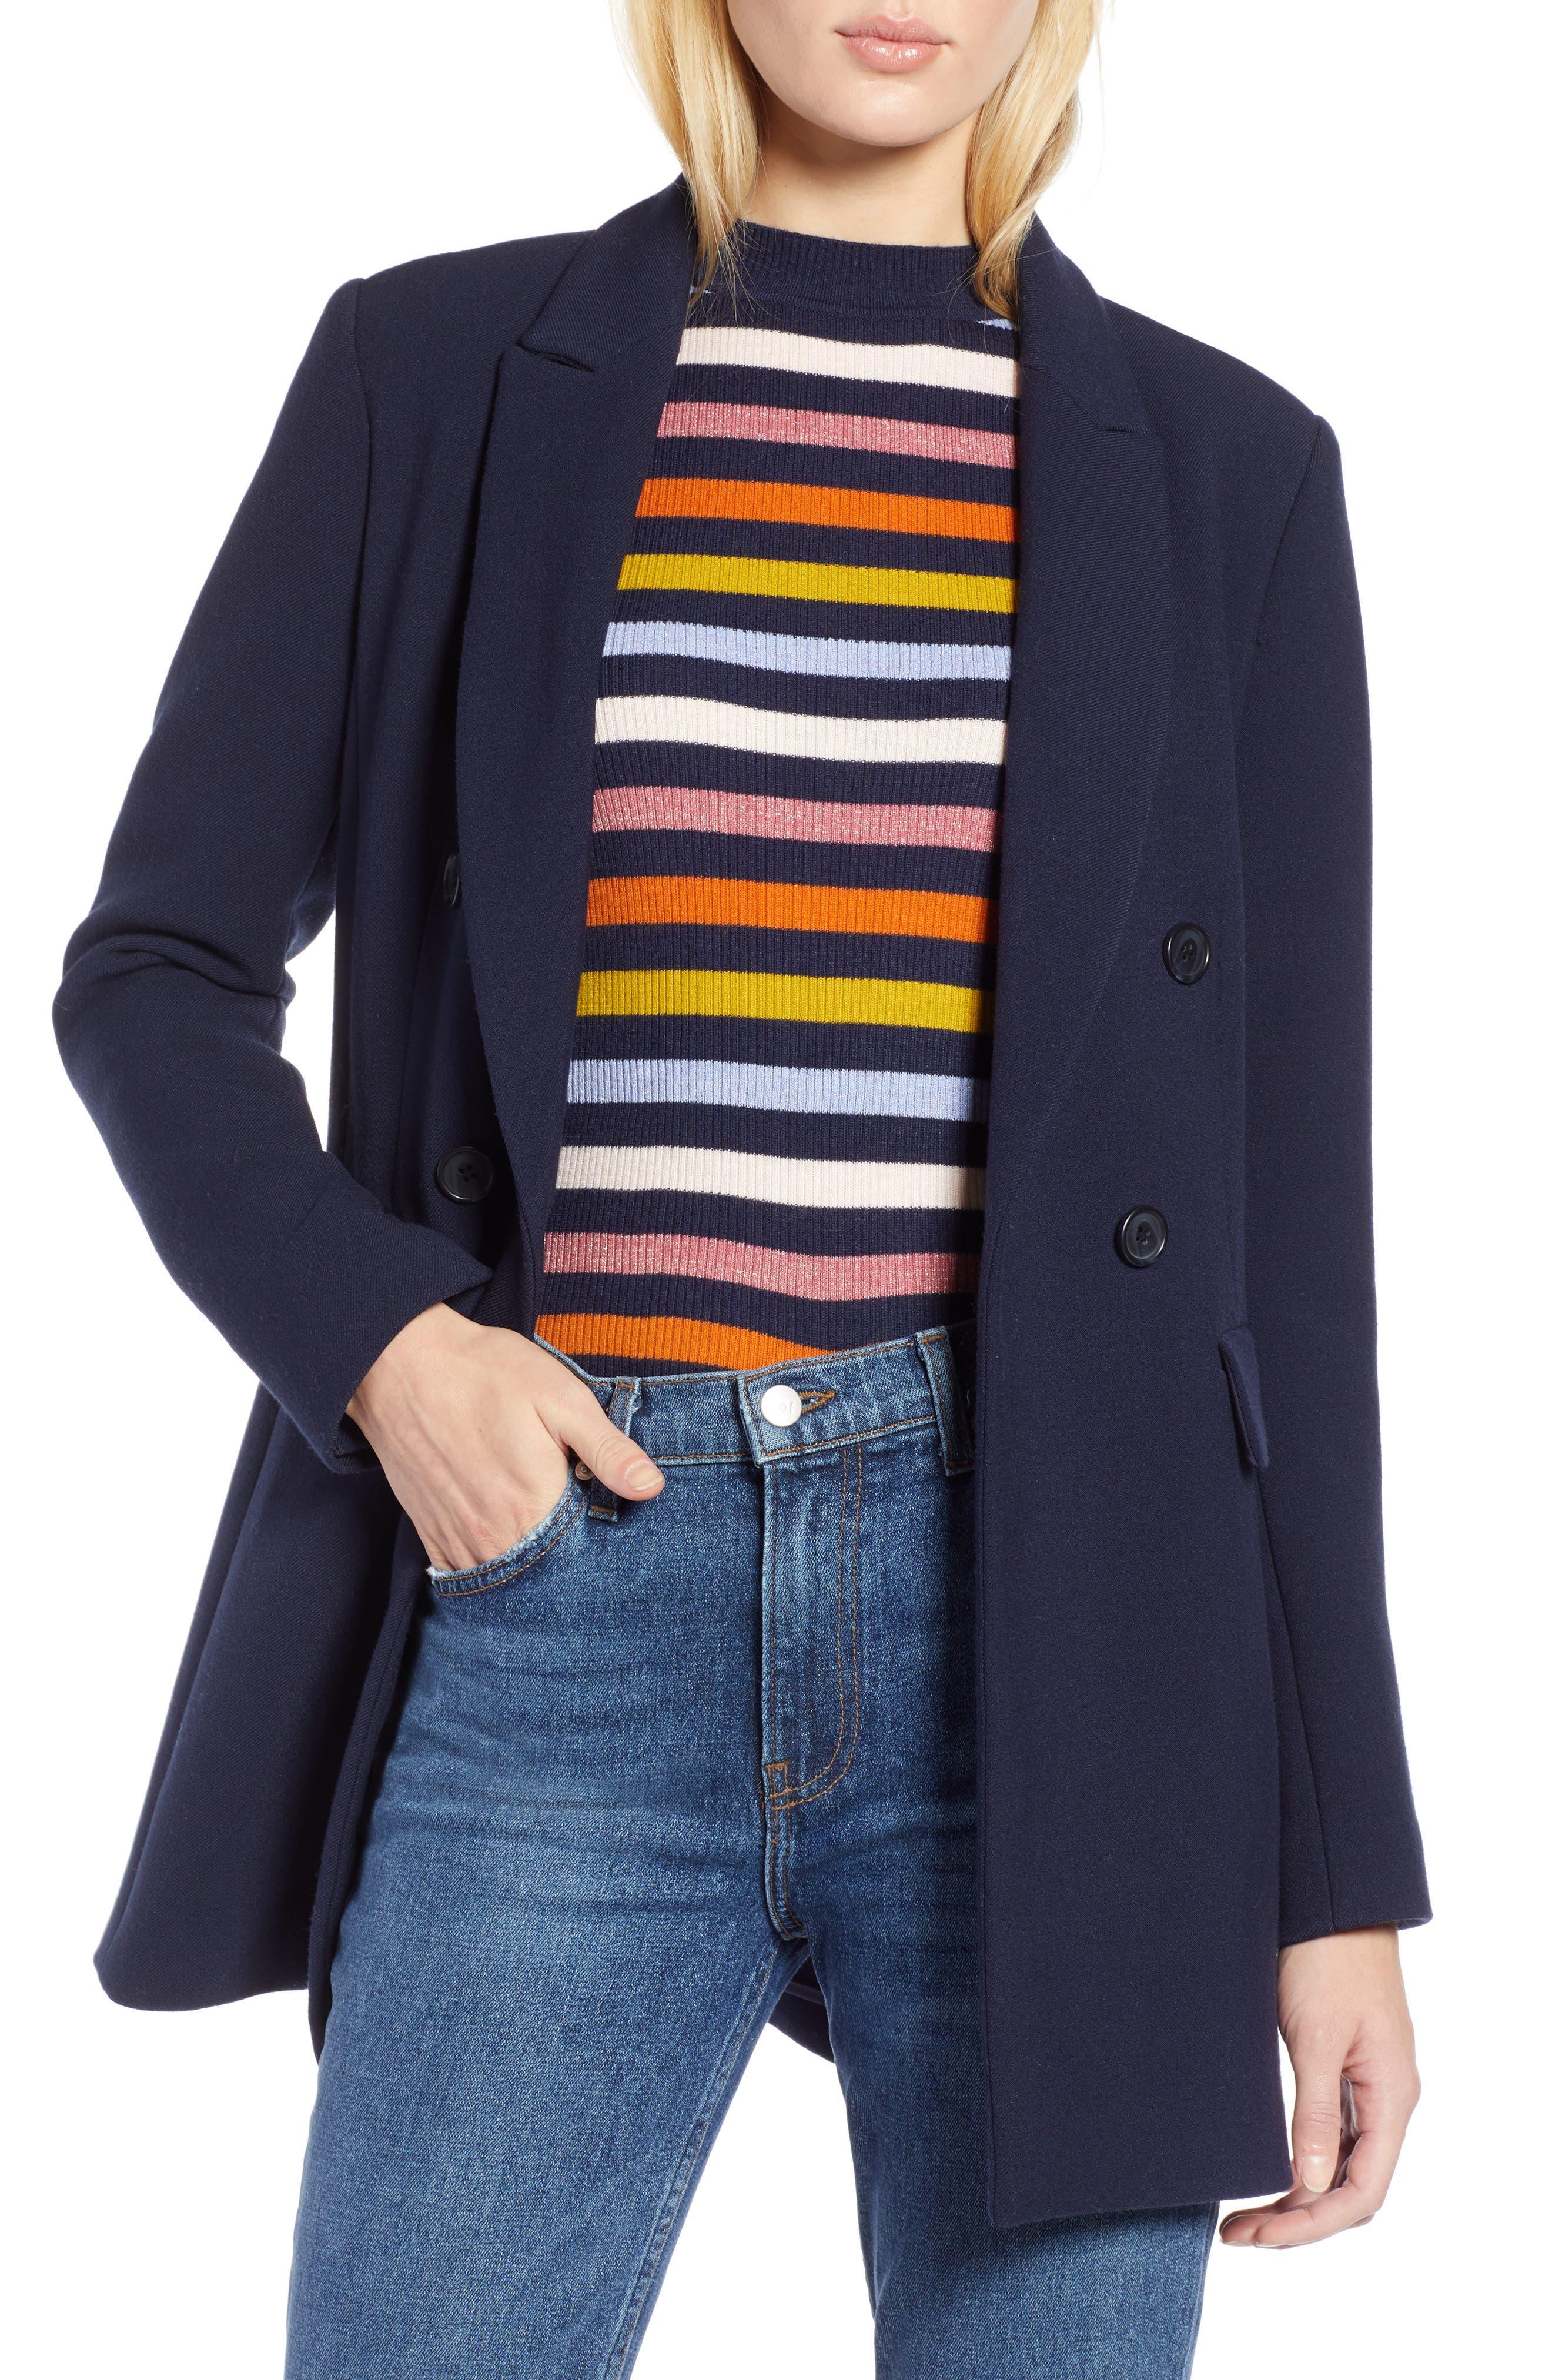 x Atlantic-Pacific Menswear Double Breasted Blazer,                         Main,                         color, NAVY